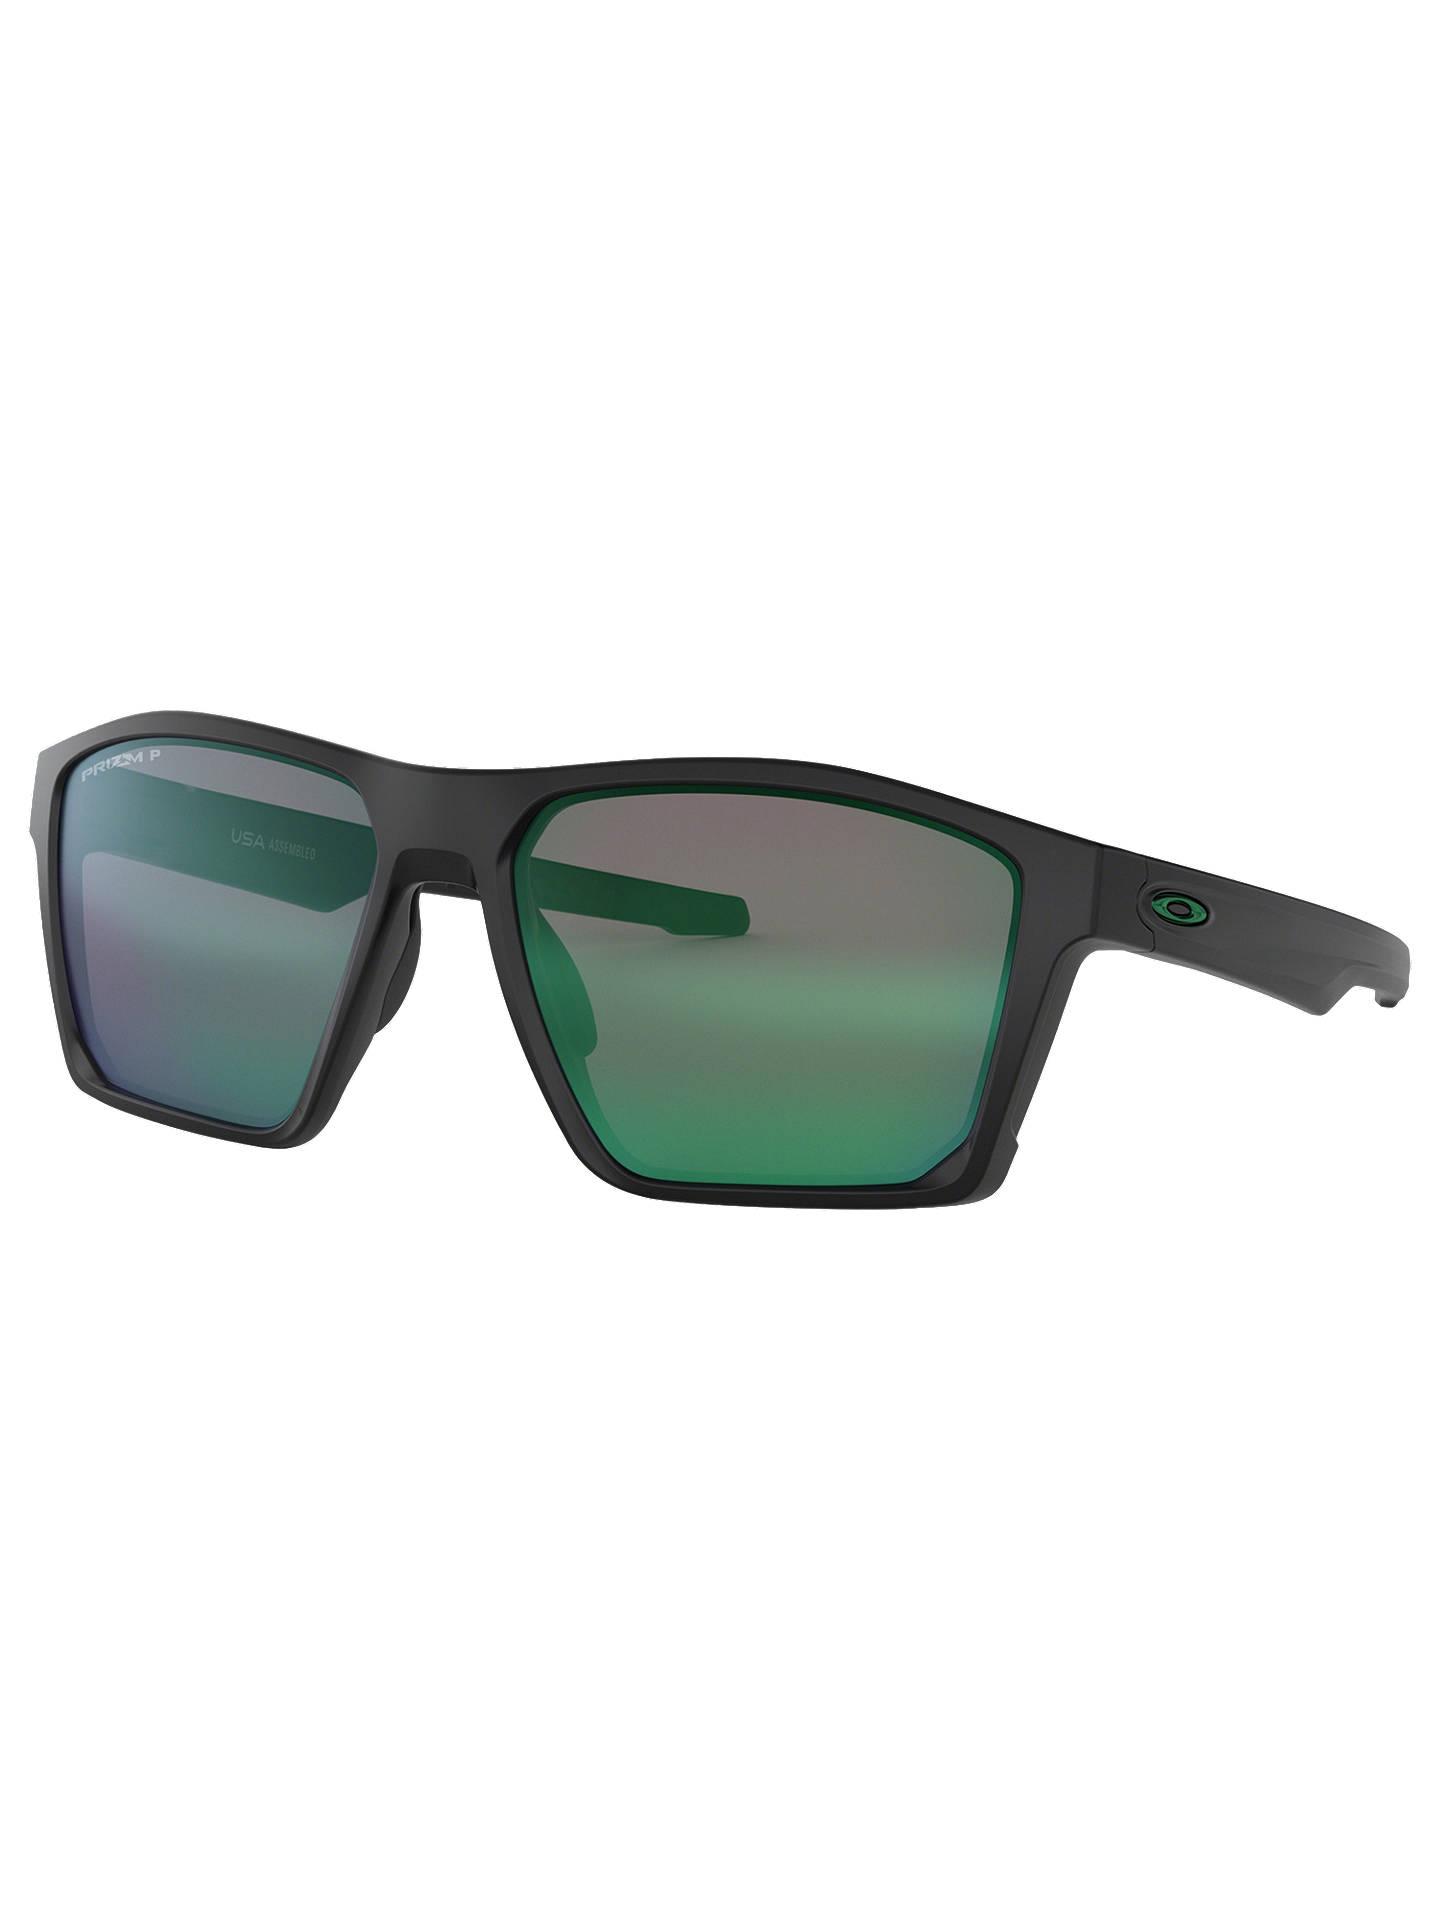 c2352f868c5 Oakley OO9397 Men s Targetline Prizm Polarised Square Sunglasses ...